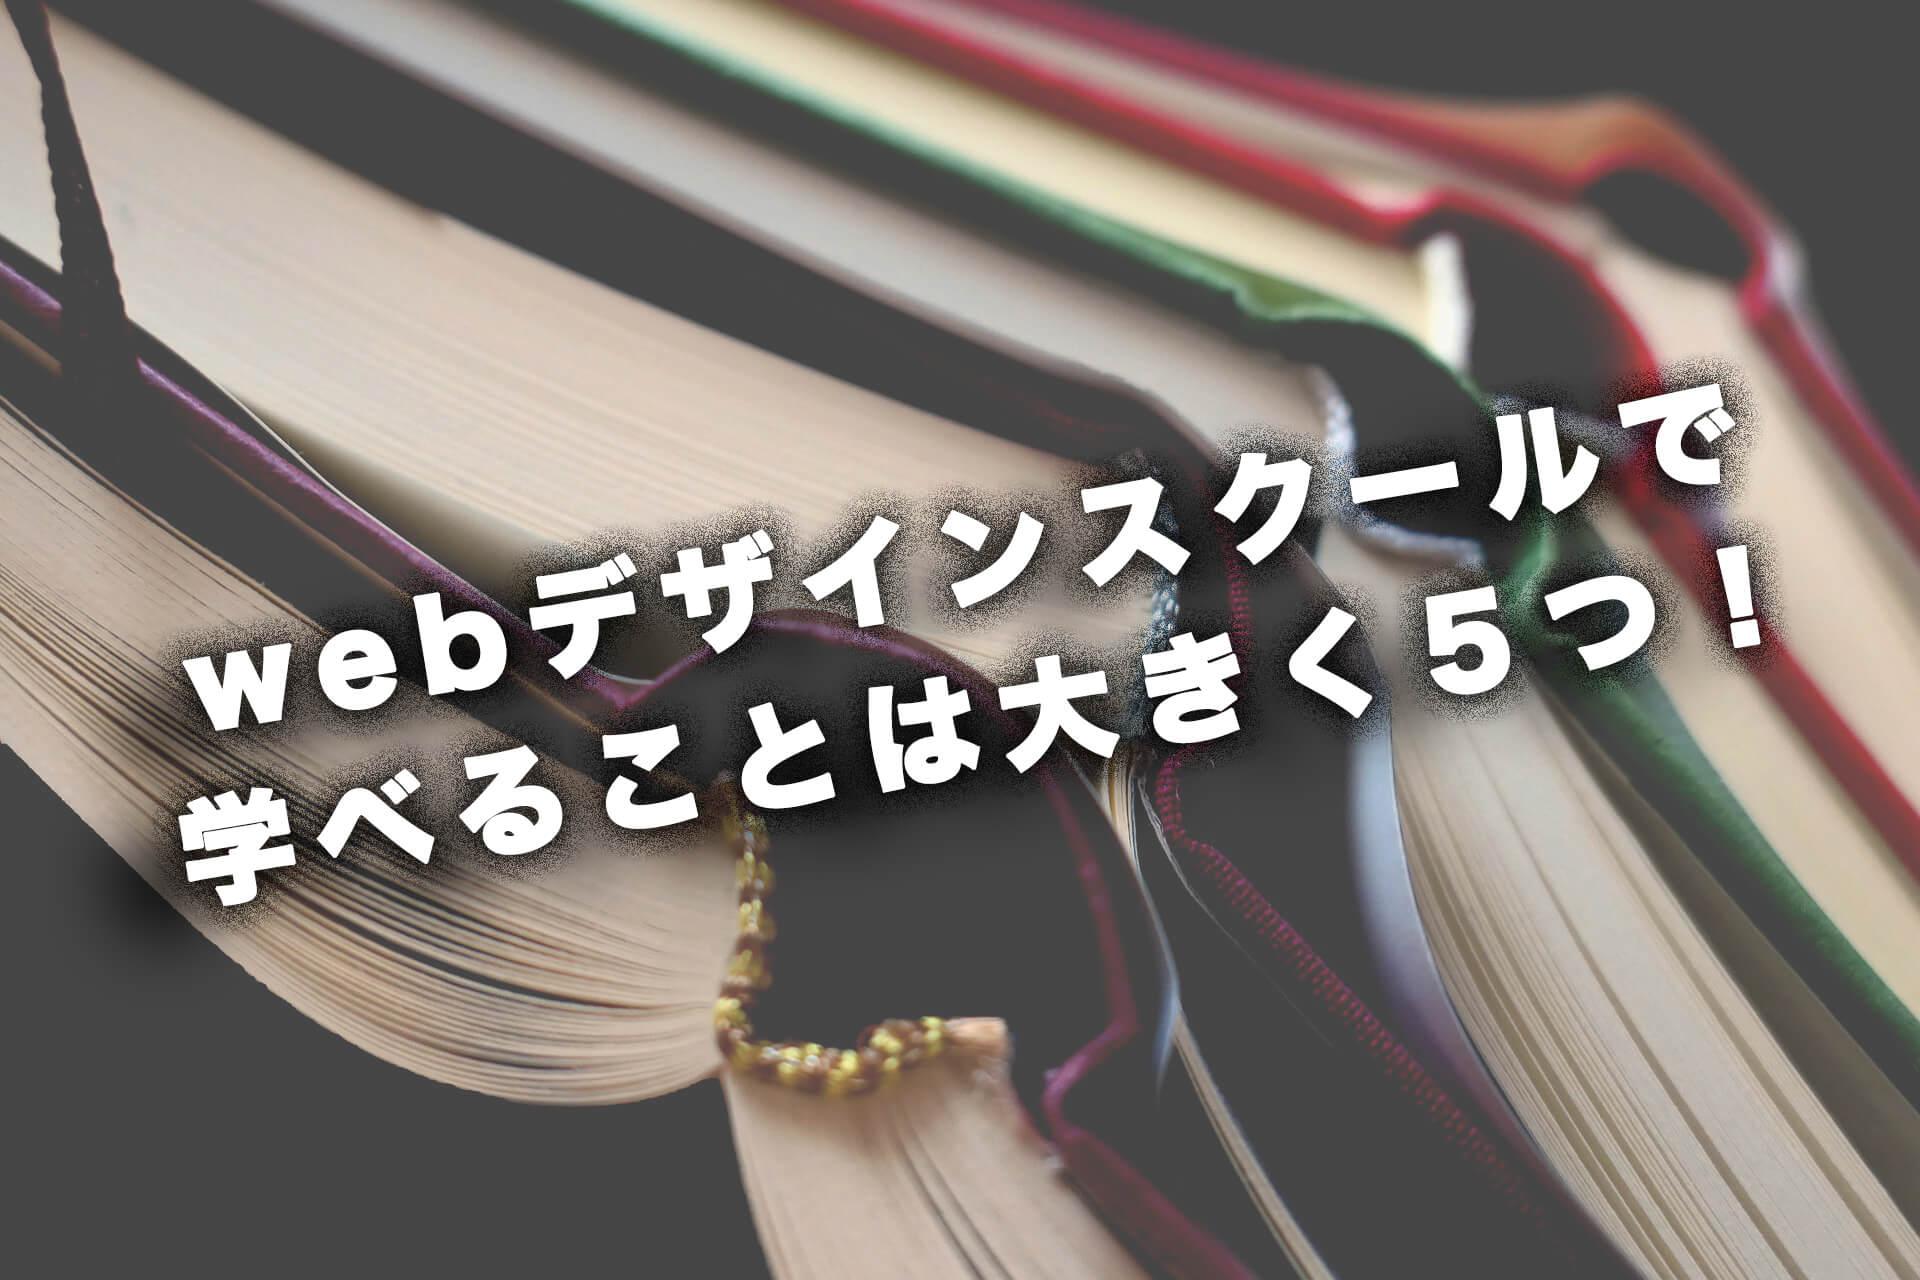 webデザイン、スクール、学ぶ3−2